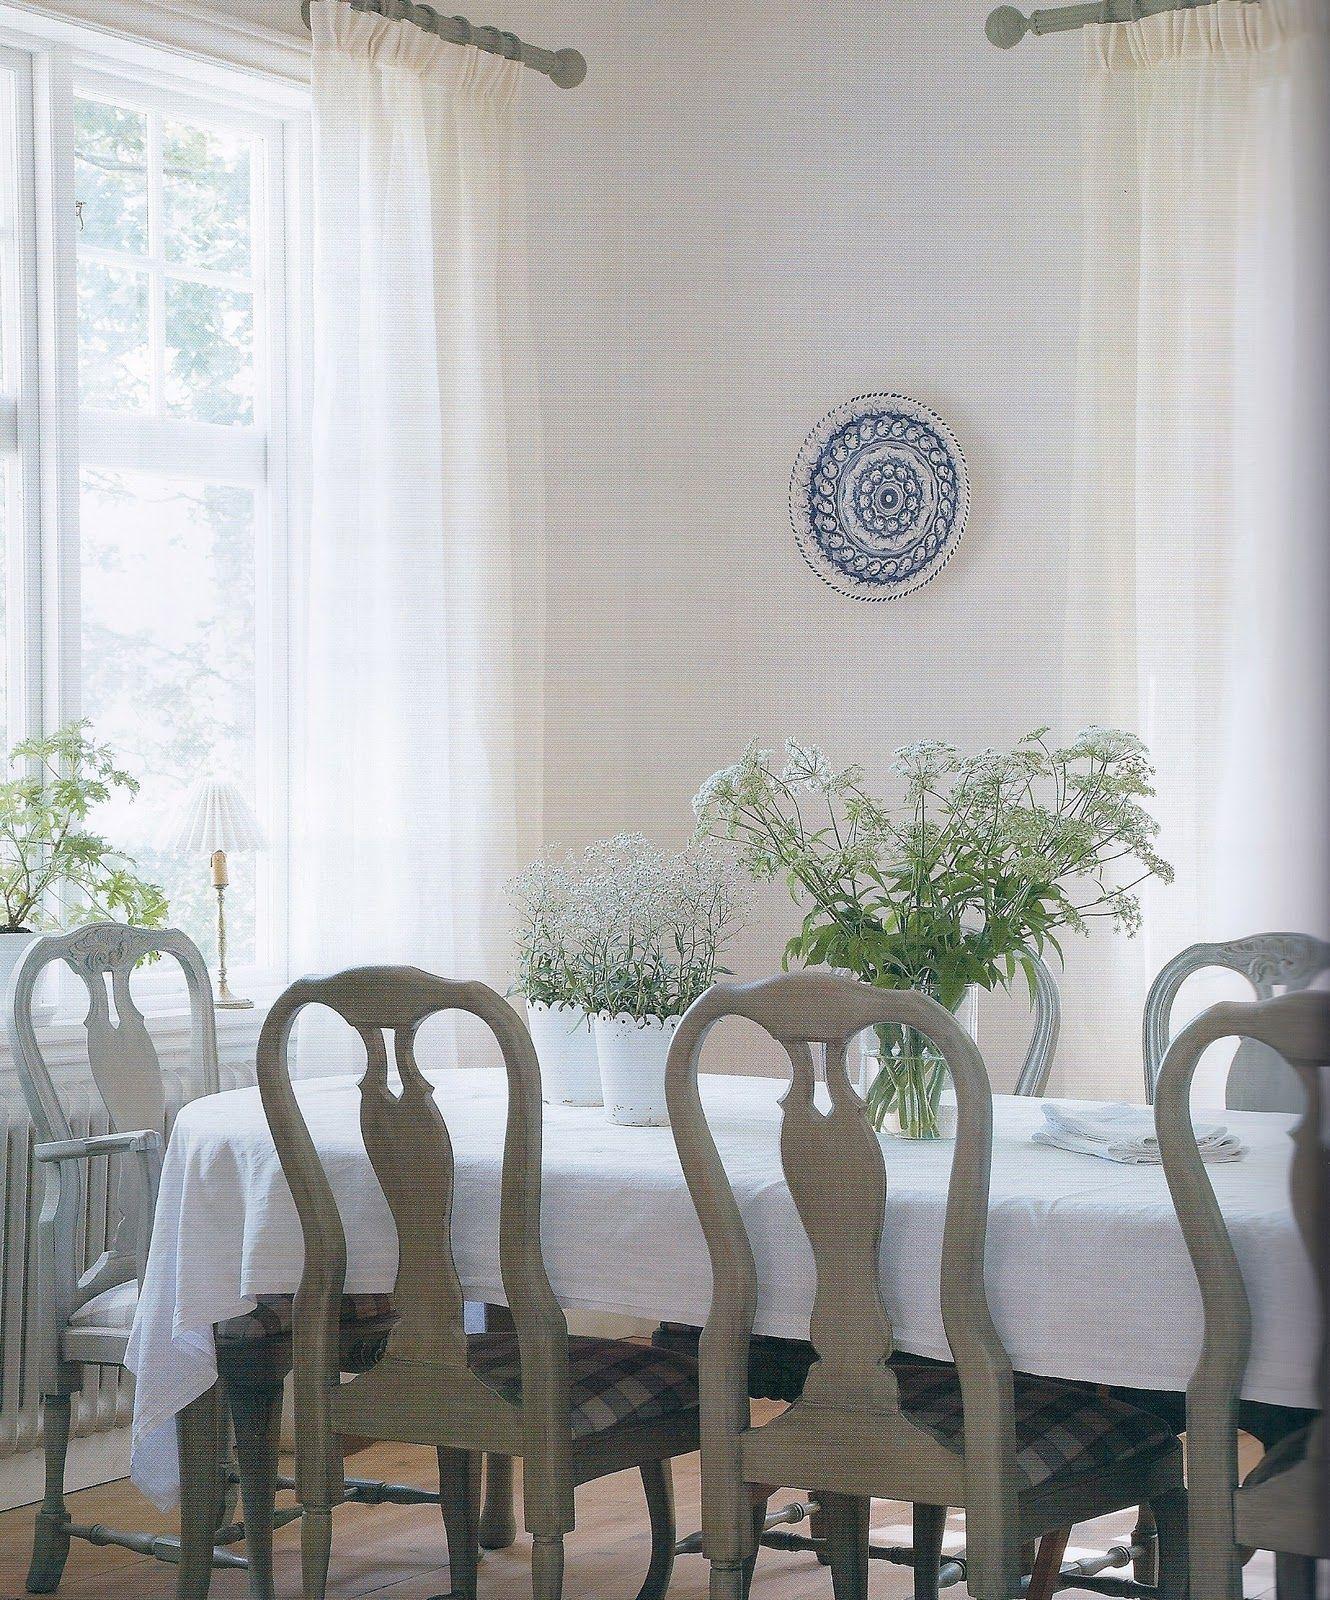 Henhurst: A Few of My Favorite Things - Gustavian Furniture